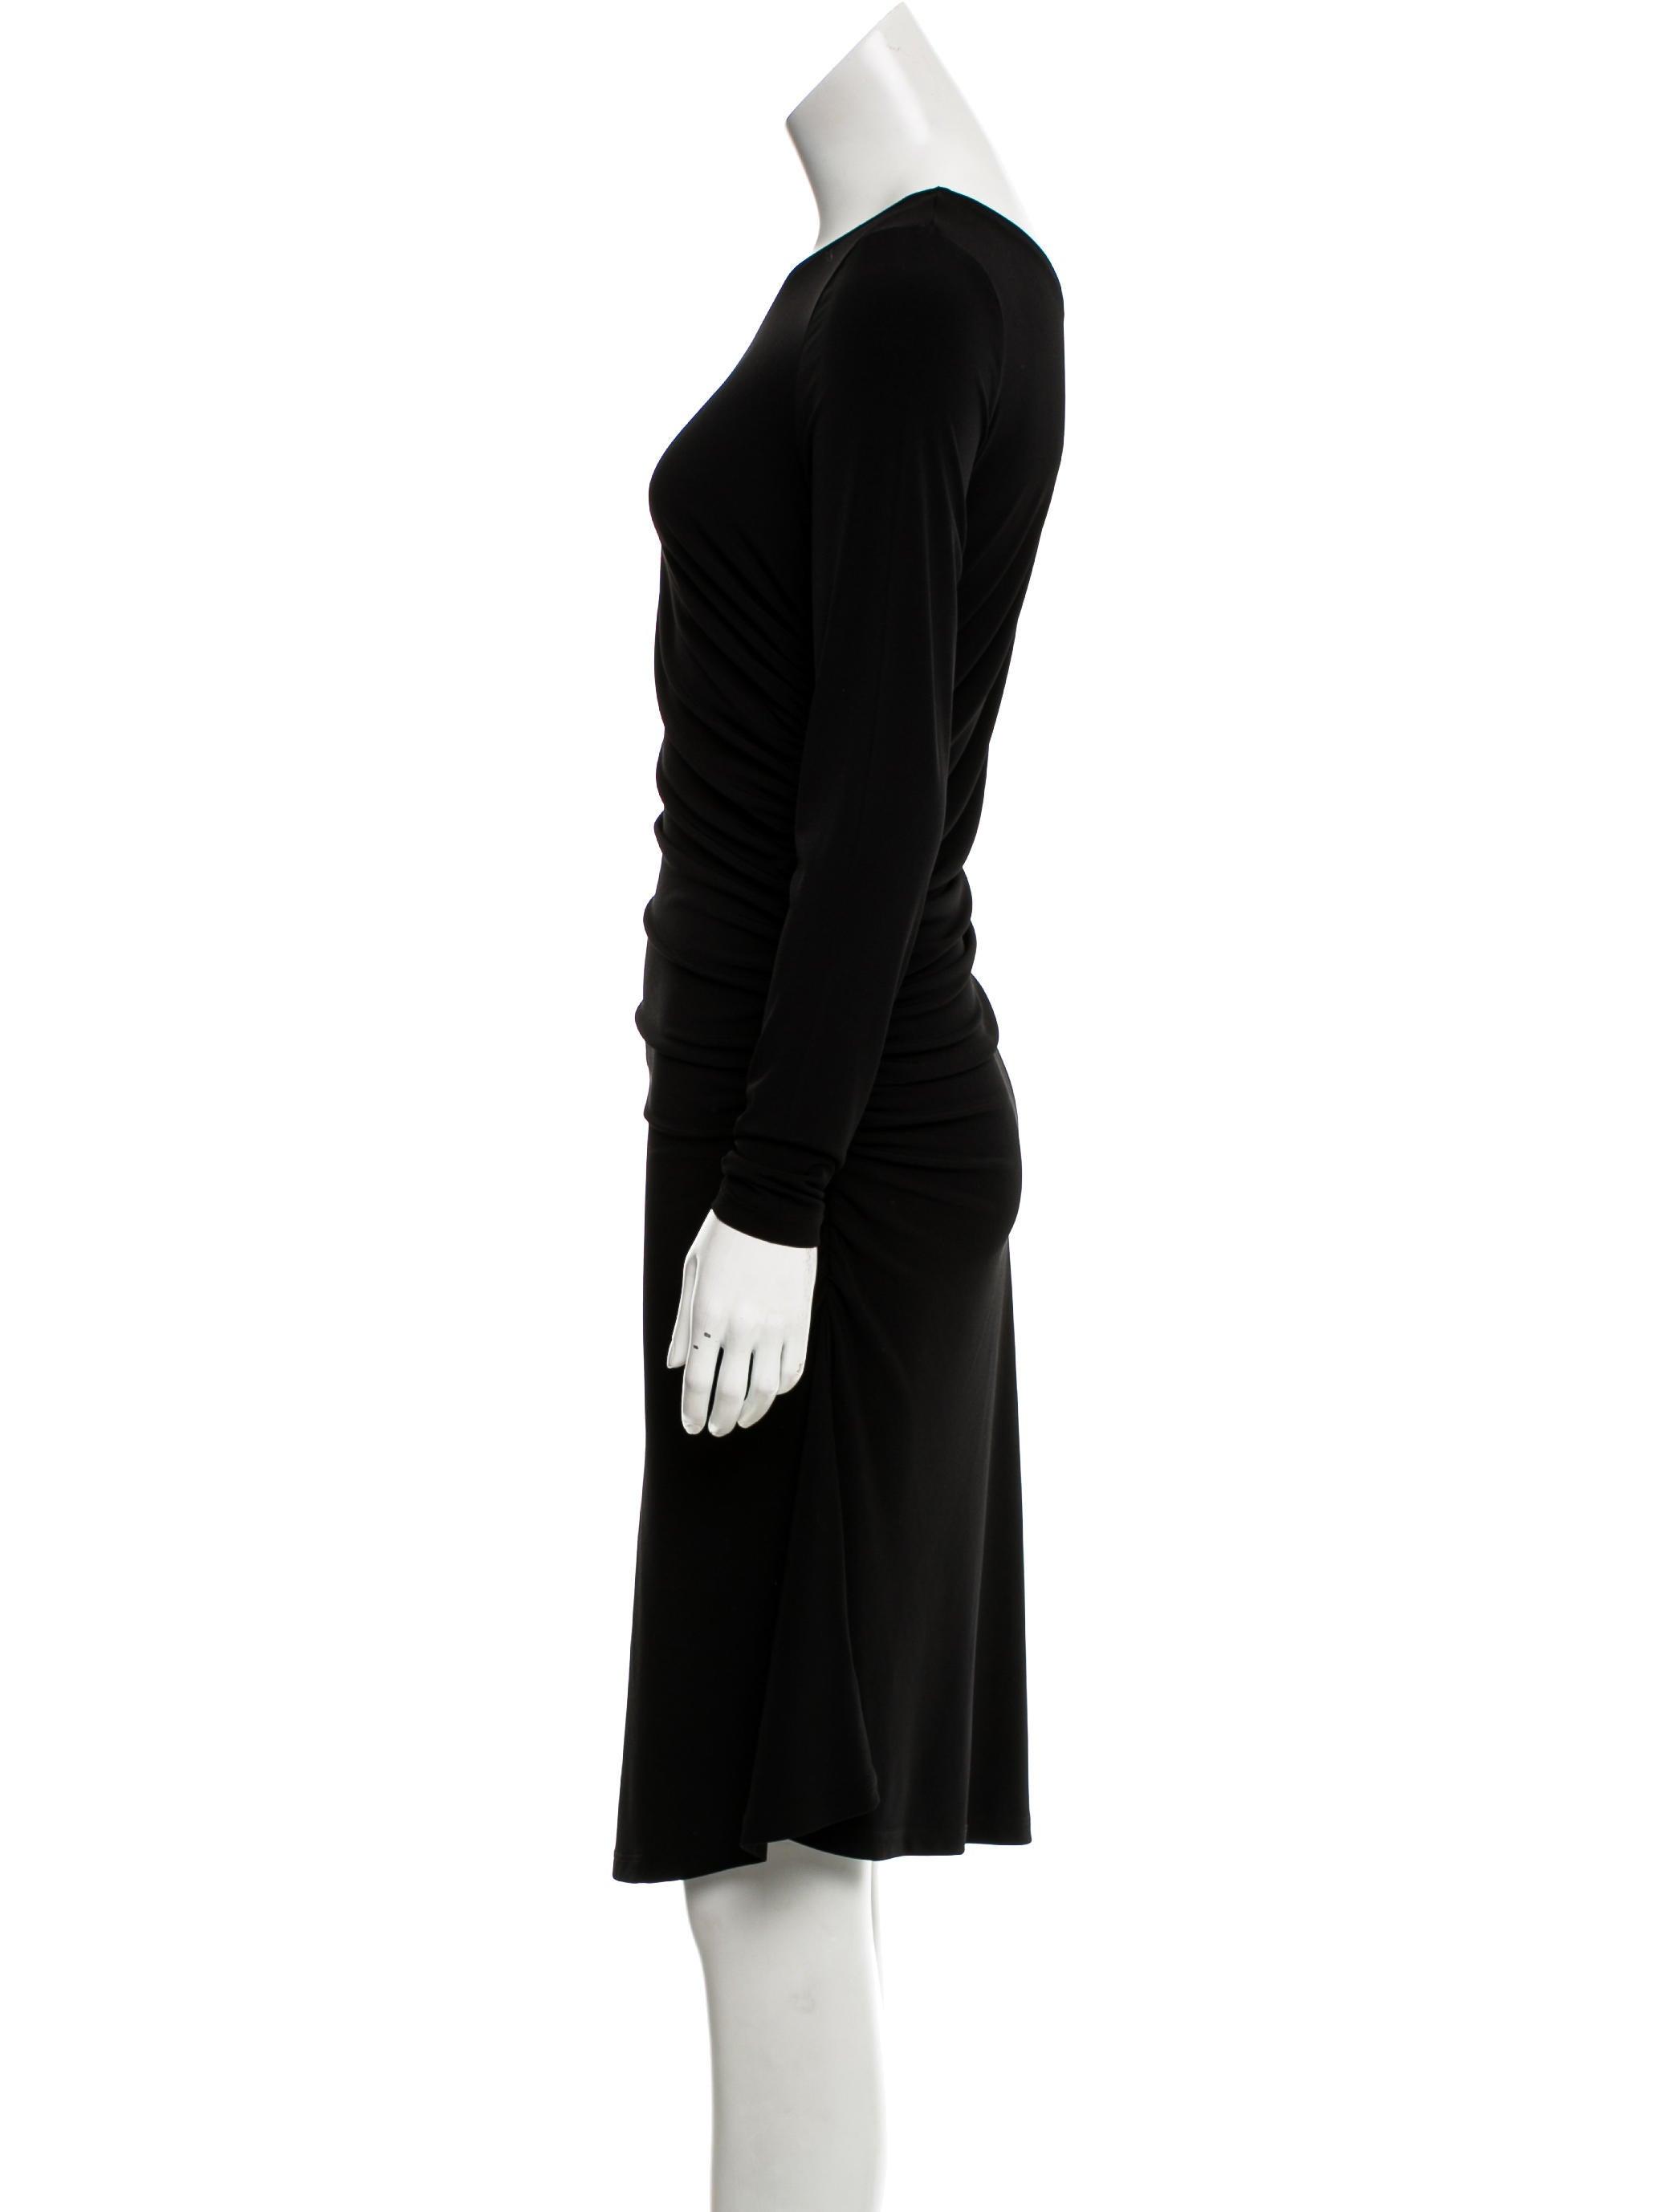 Michael Michael Kors One Shoulder Evening Dress - Dresses - WM529600 ...